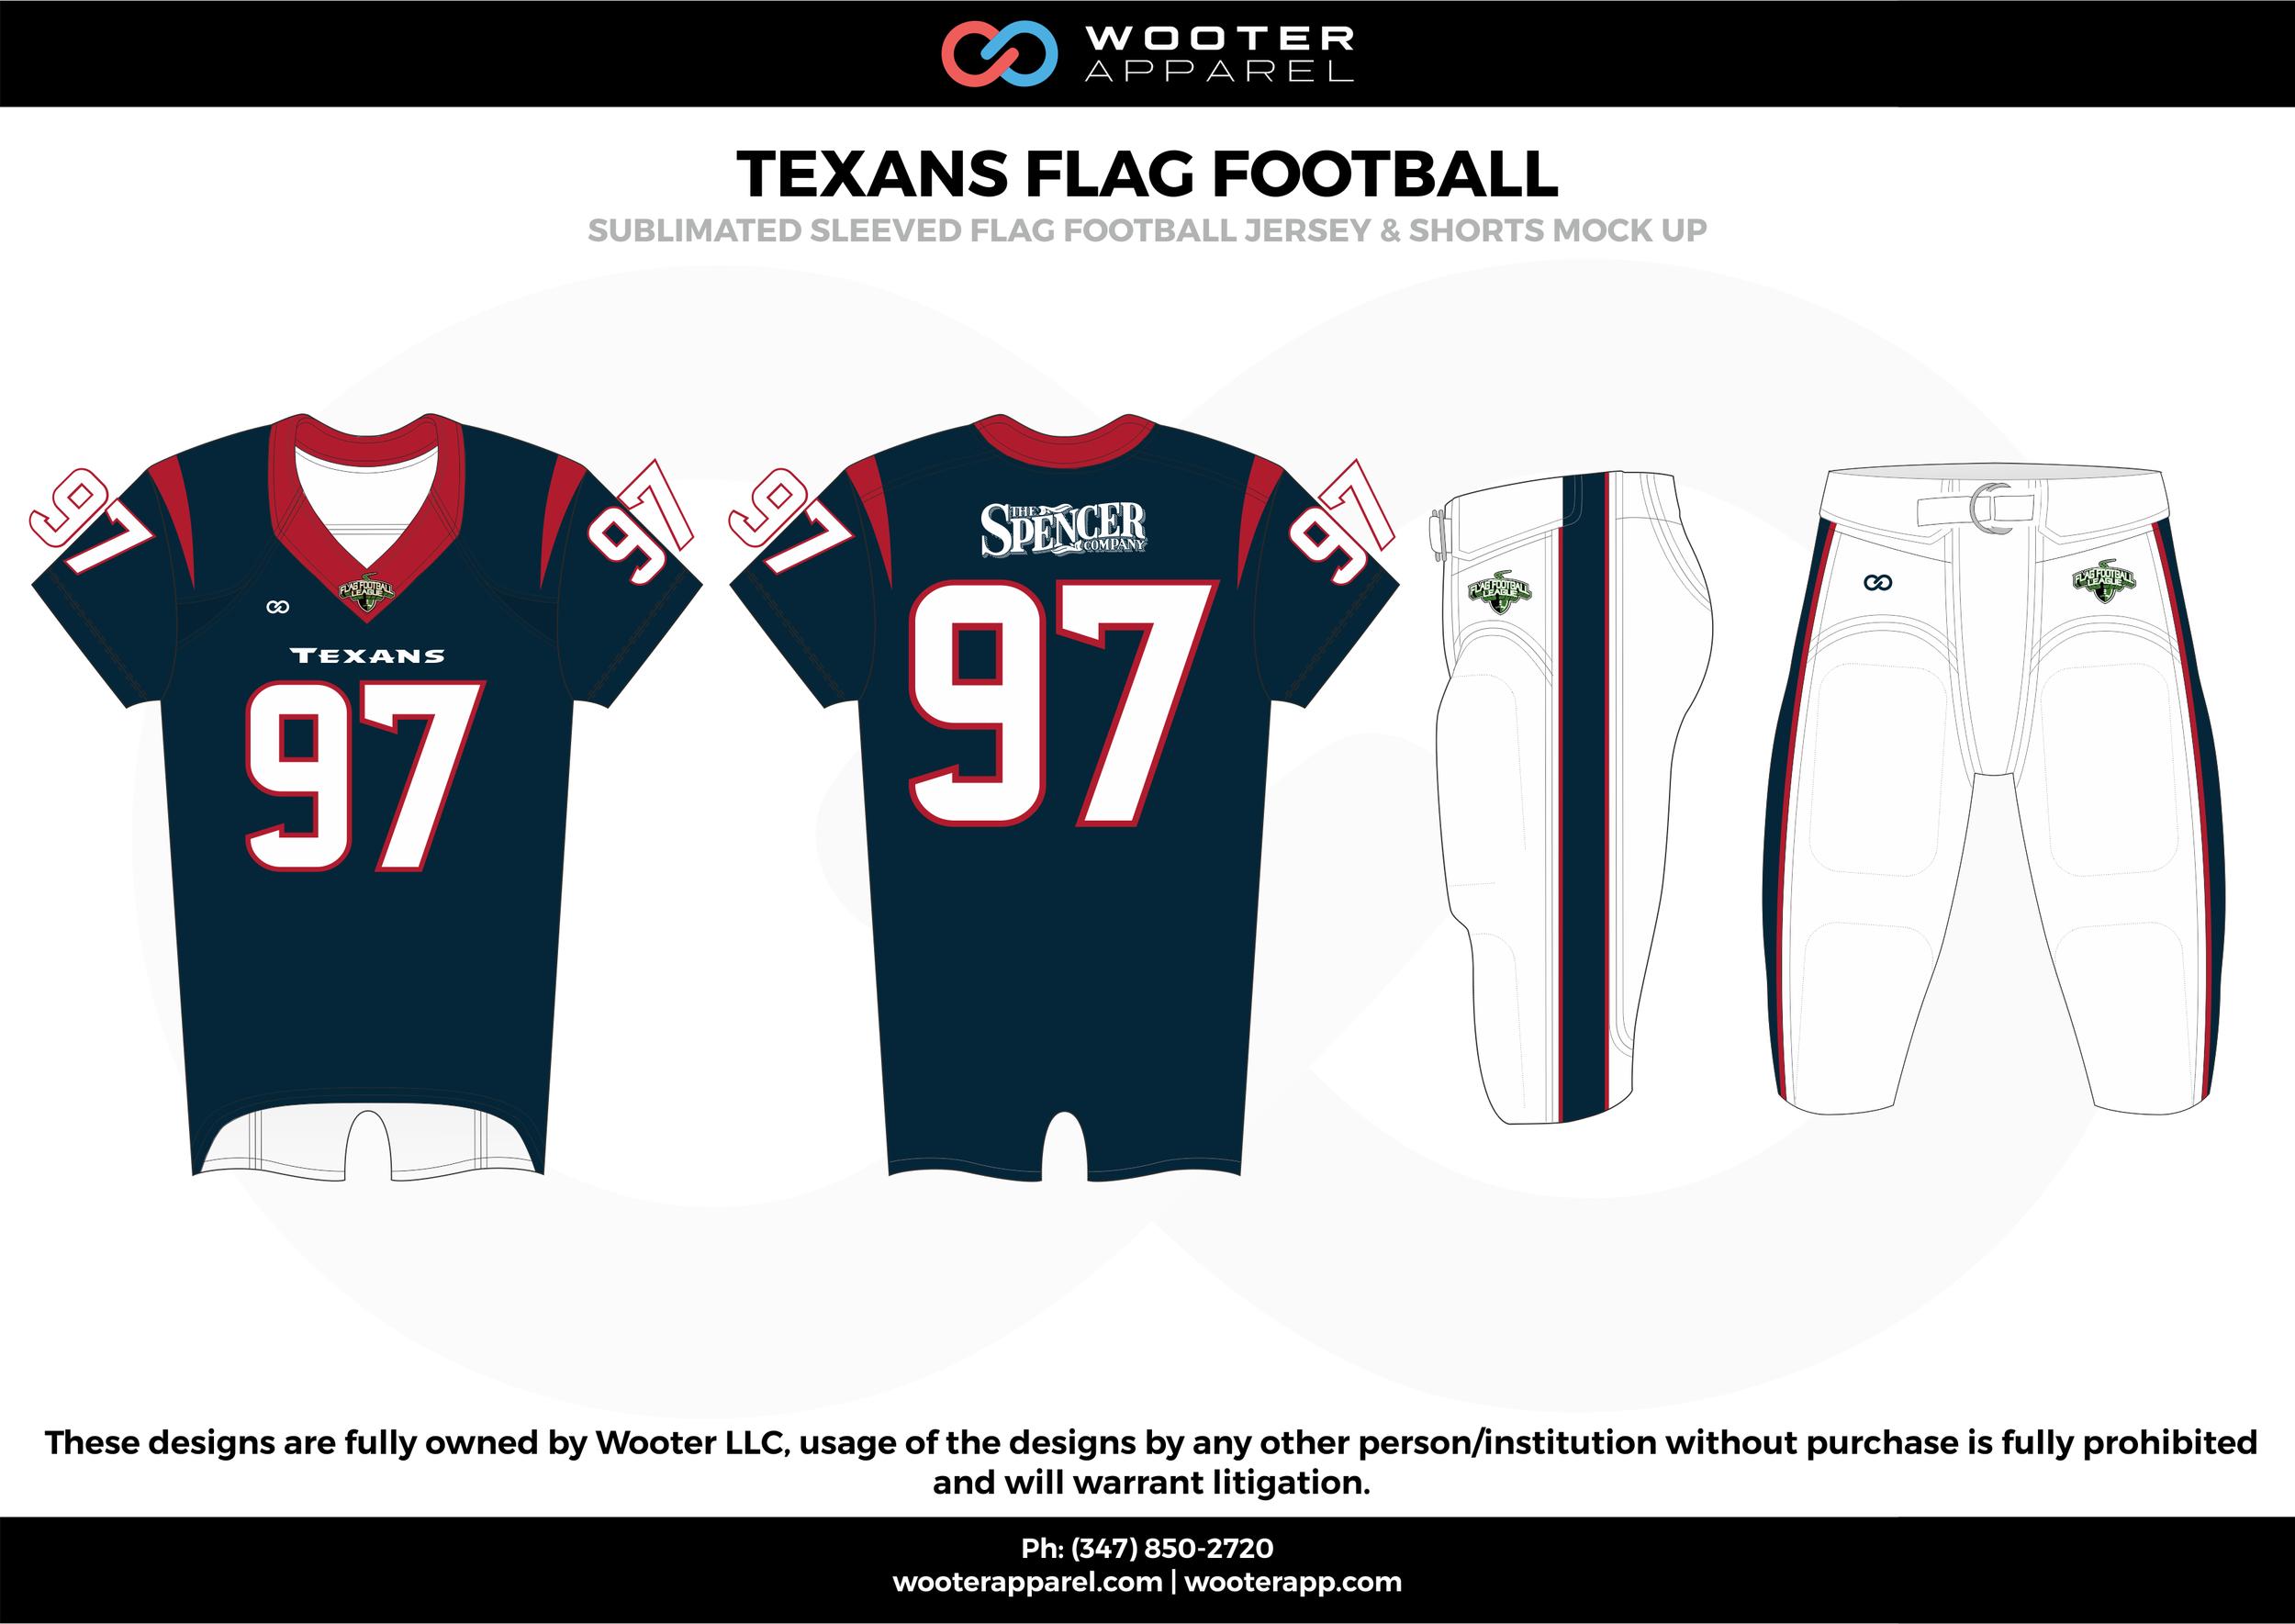 TEXANS FLAG FOOTBALL blue white red flag football uniforms jerseys pants